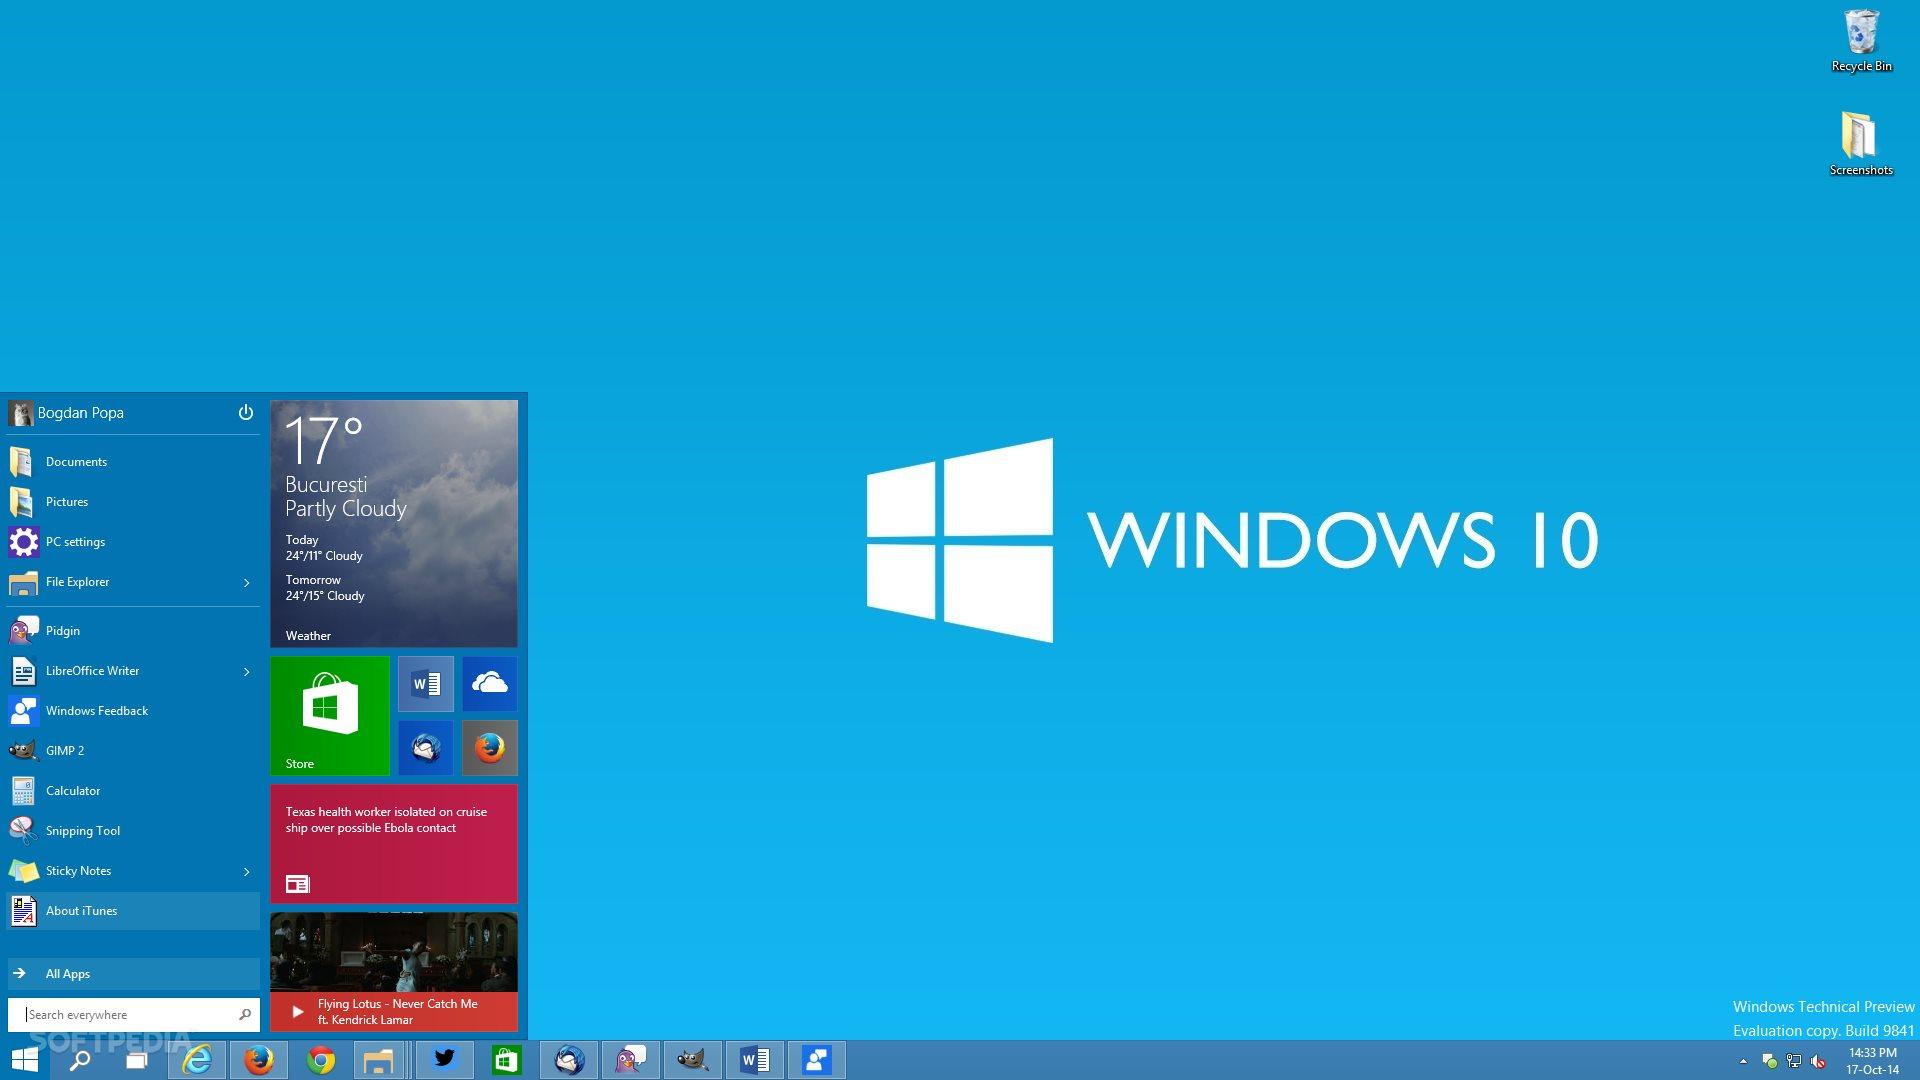 Windows 10 Preview 10 Usability Screenshots win10themesnet 1920x1080